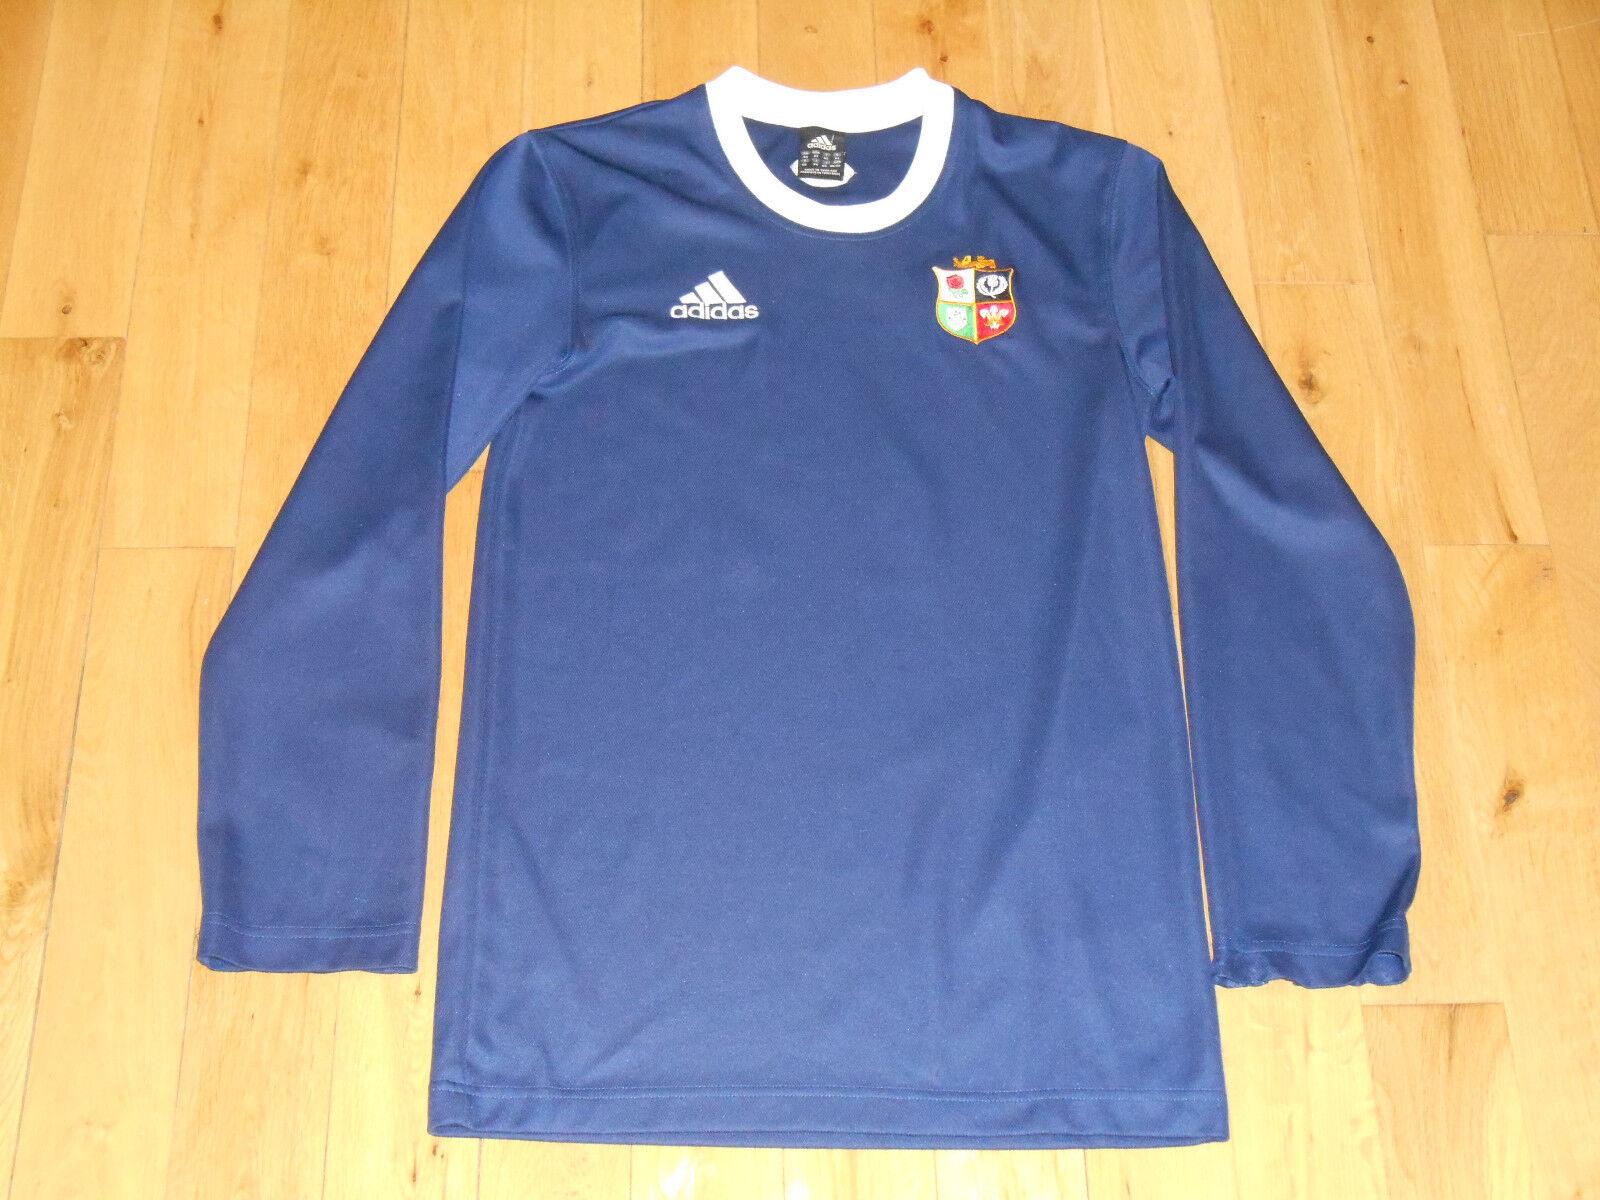 British & amp;Maillot de rugby Lions irlandais # 10 Adidas à manches longues Bleu Hommes X-Small